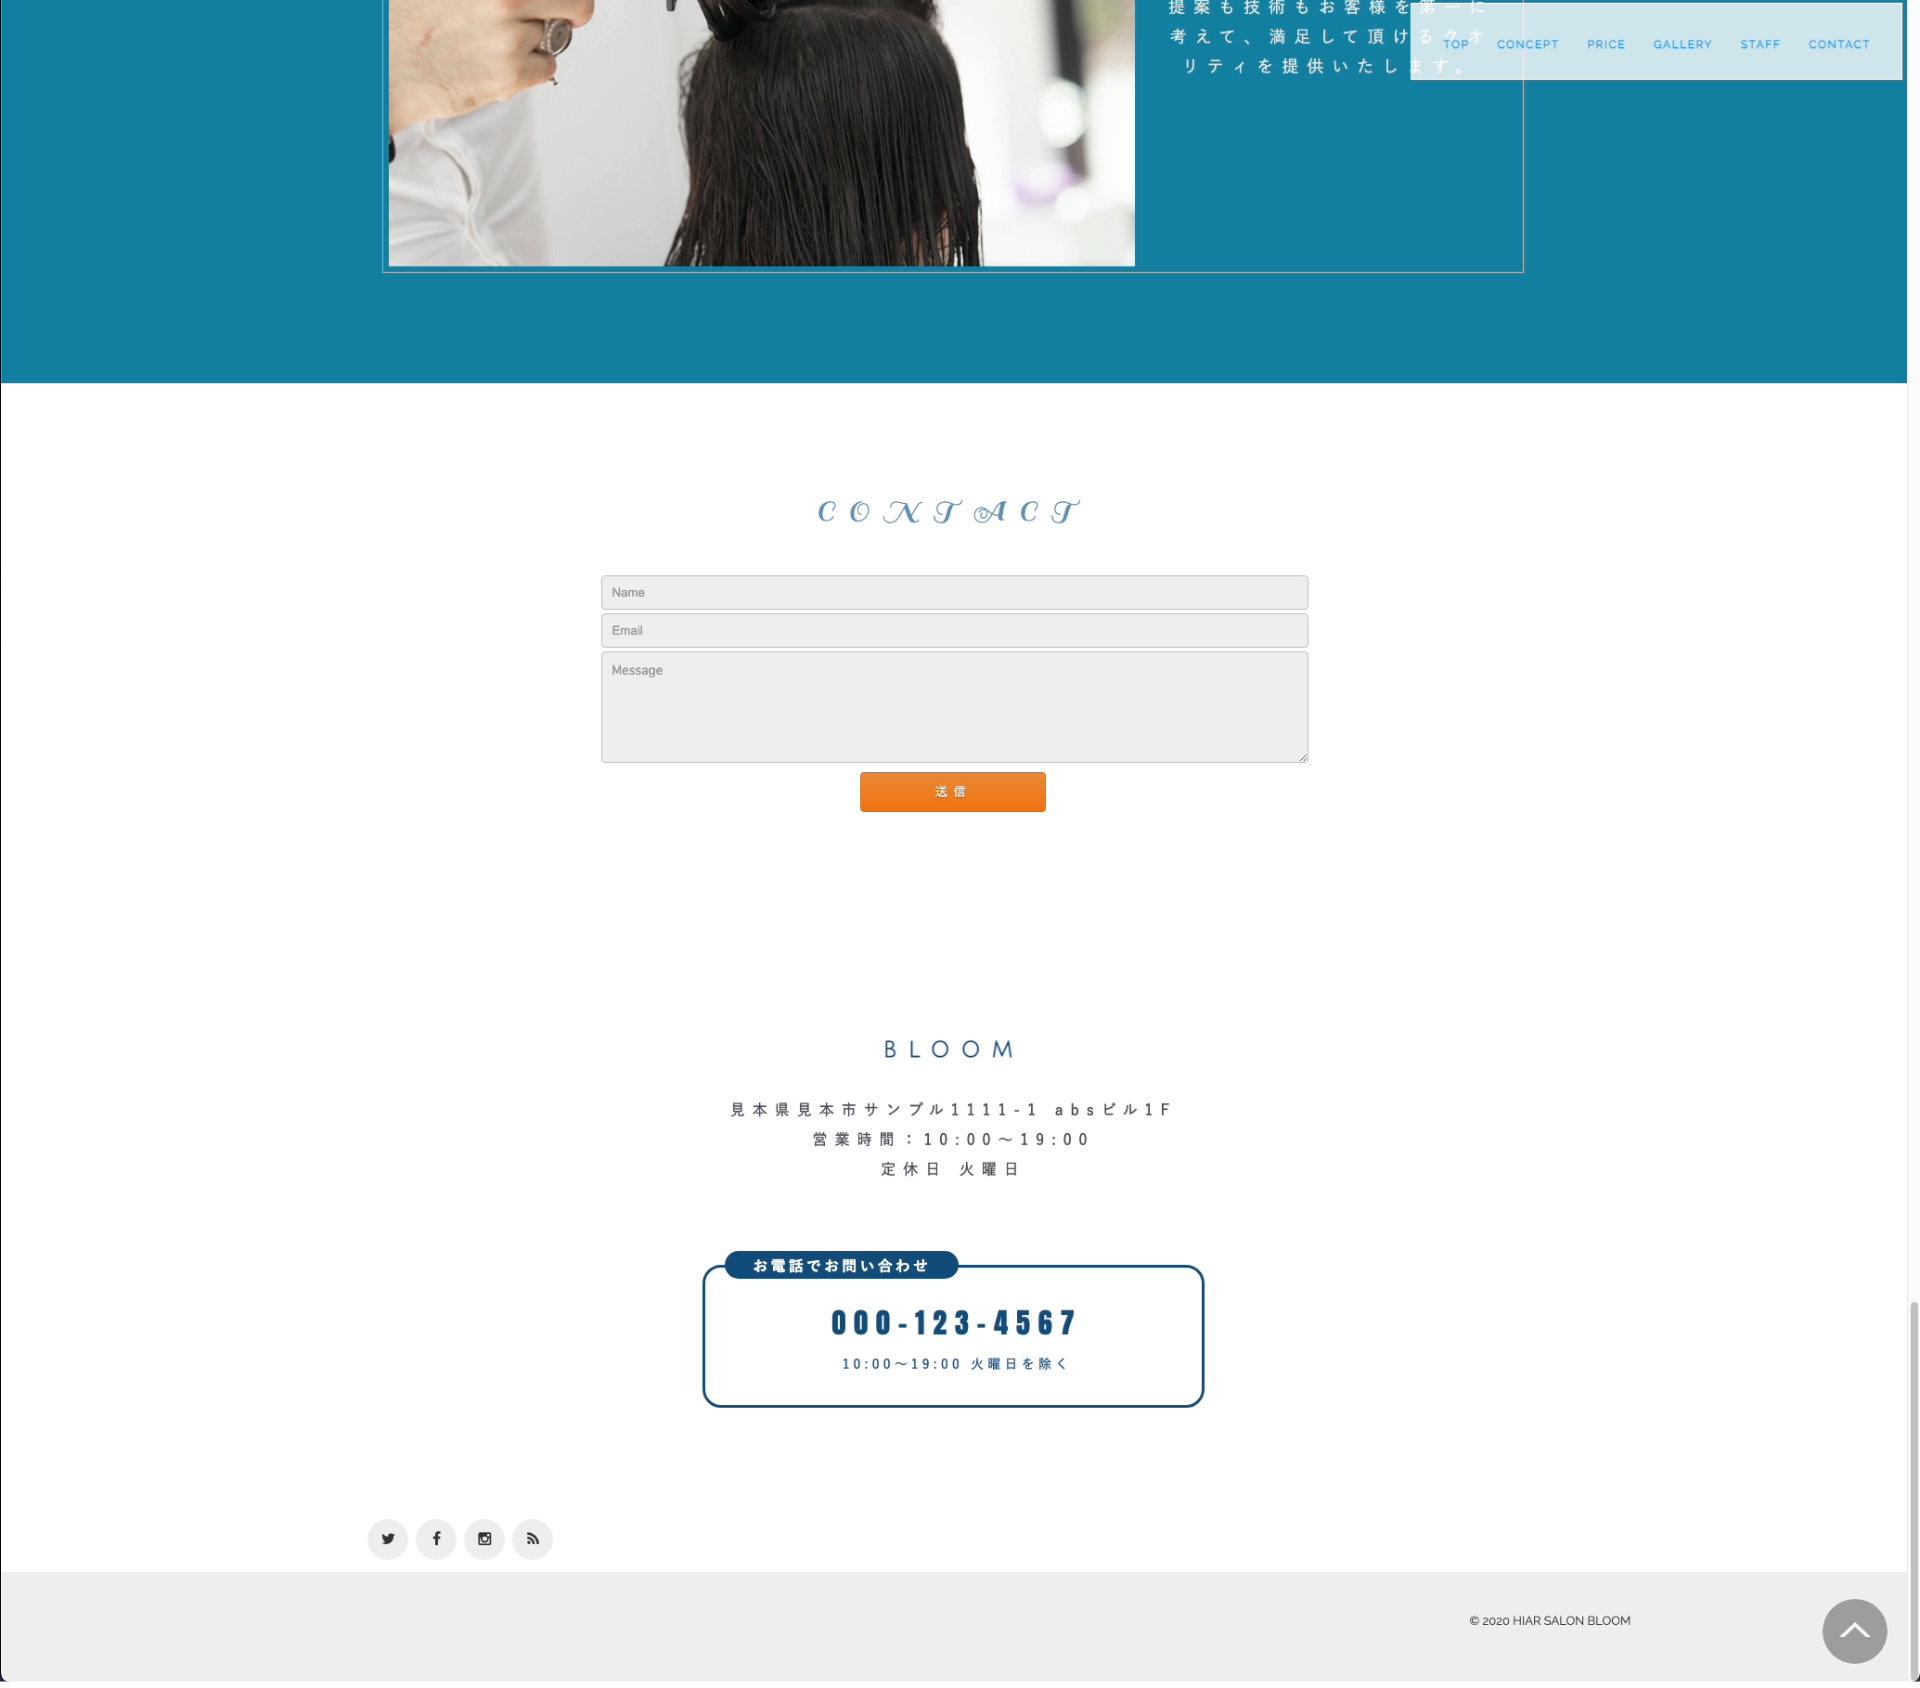 HTMLで作成したお問い合わせフォームにGoogleフォームを実装しテスト送信